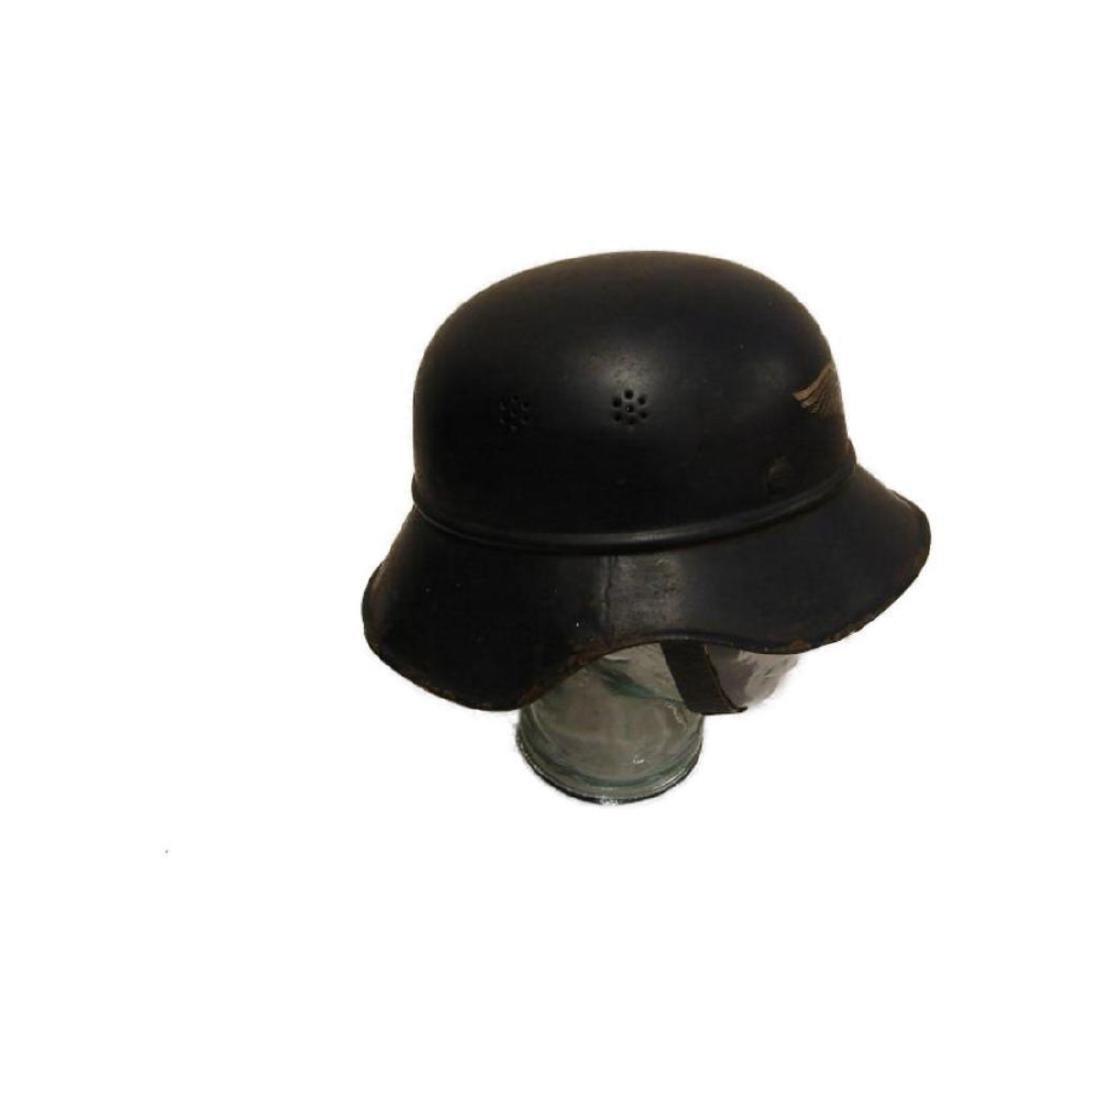 WWII Nazi German Luftschutz Helmet - 2